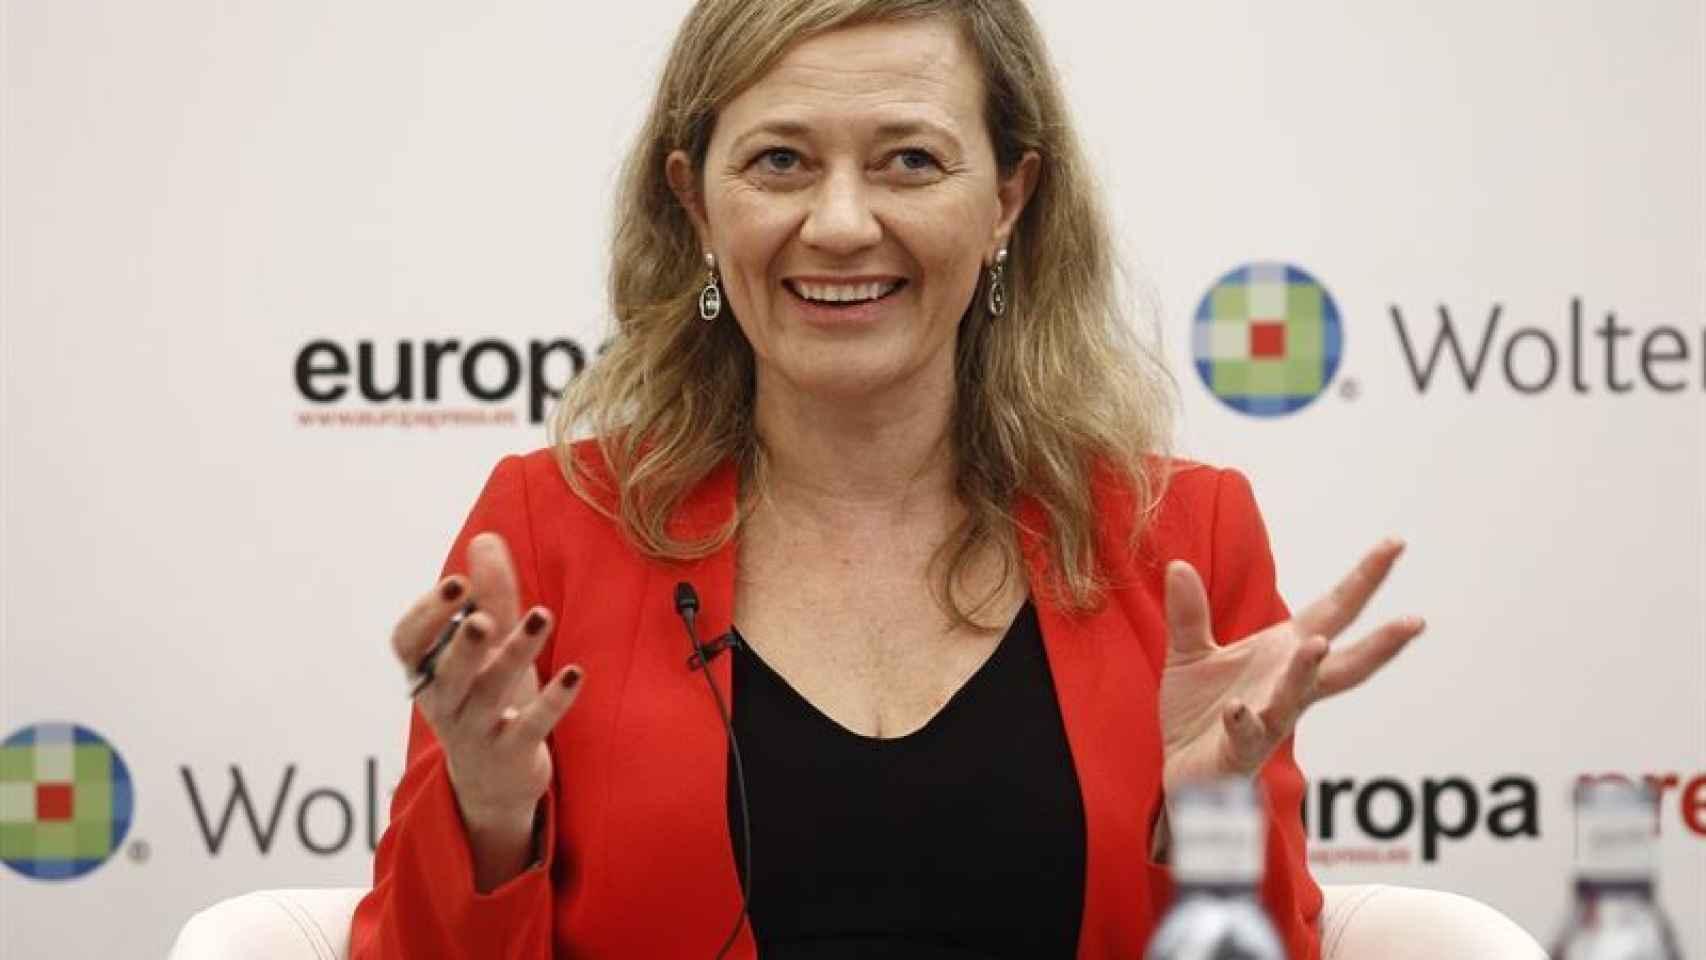 La diputada de Podemos Victoria Rosell